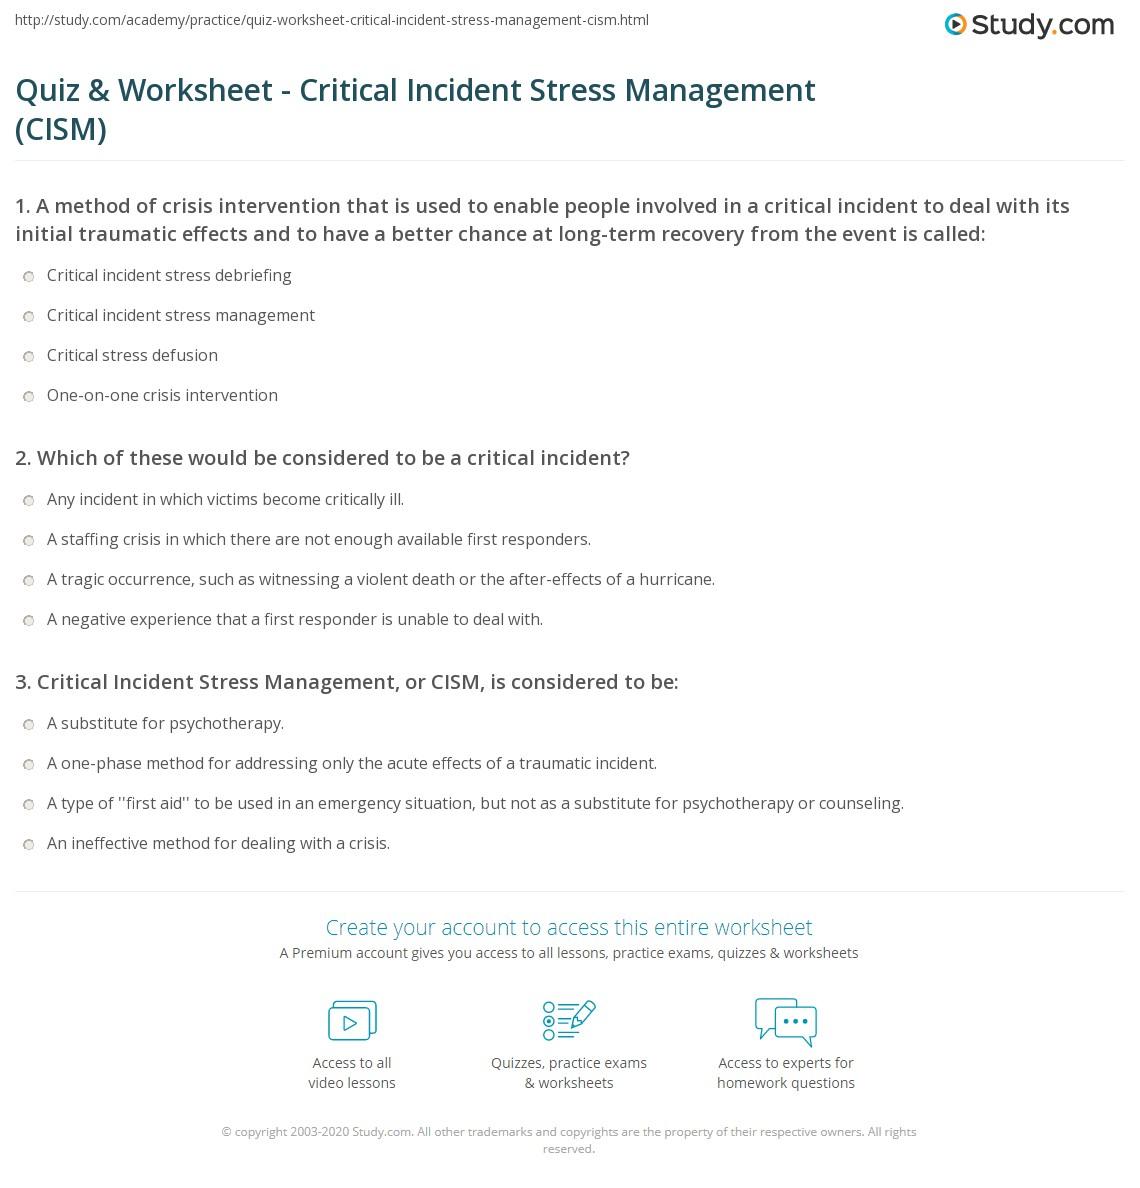 Quiz worksheet critical incident stress management cism print critical incident stress management definition application process worksheet 1betcityfo Choice Image